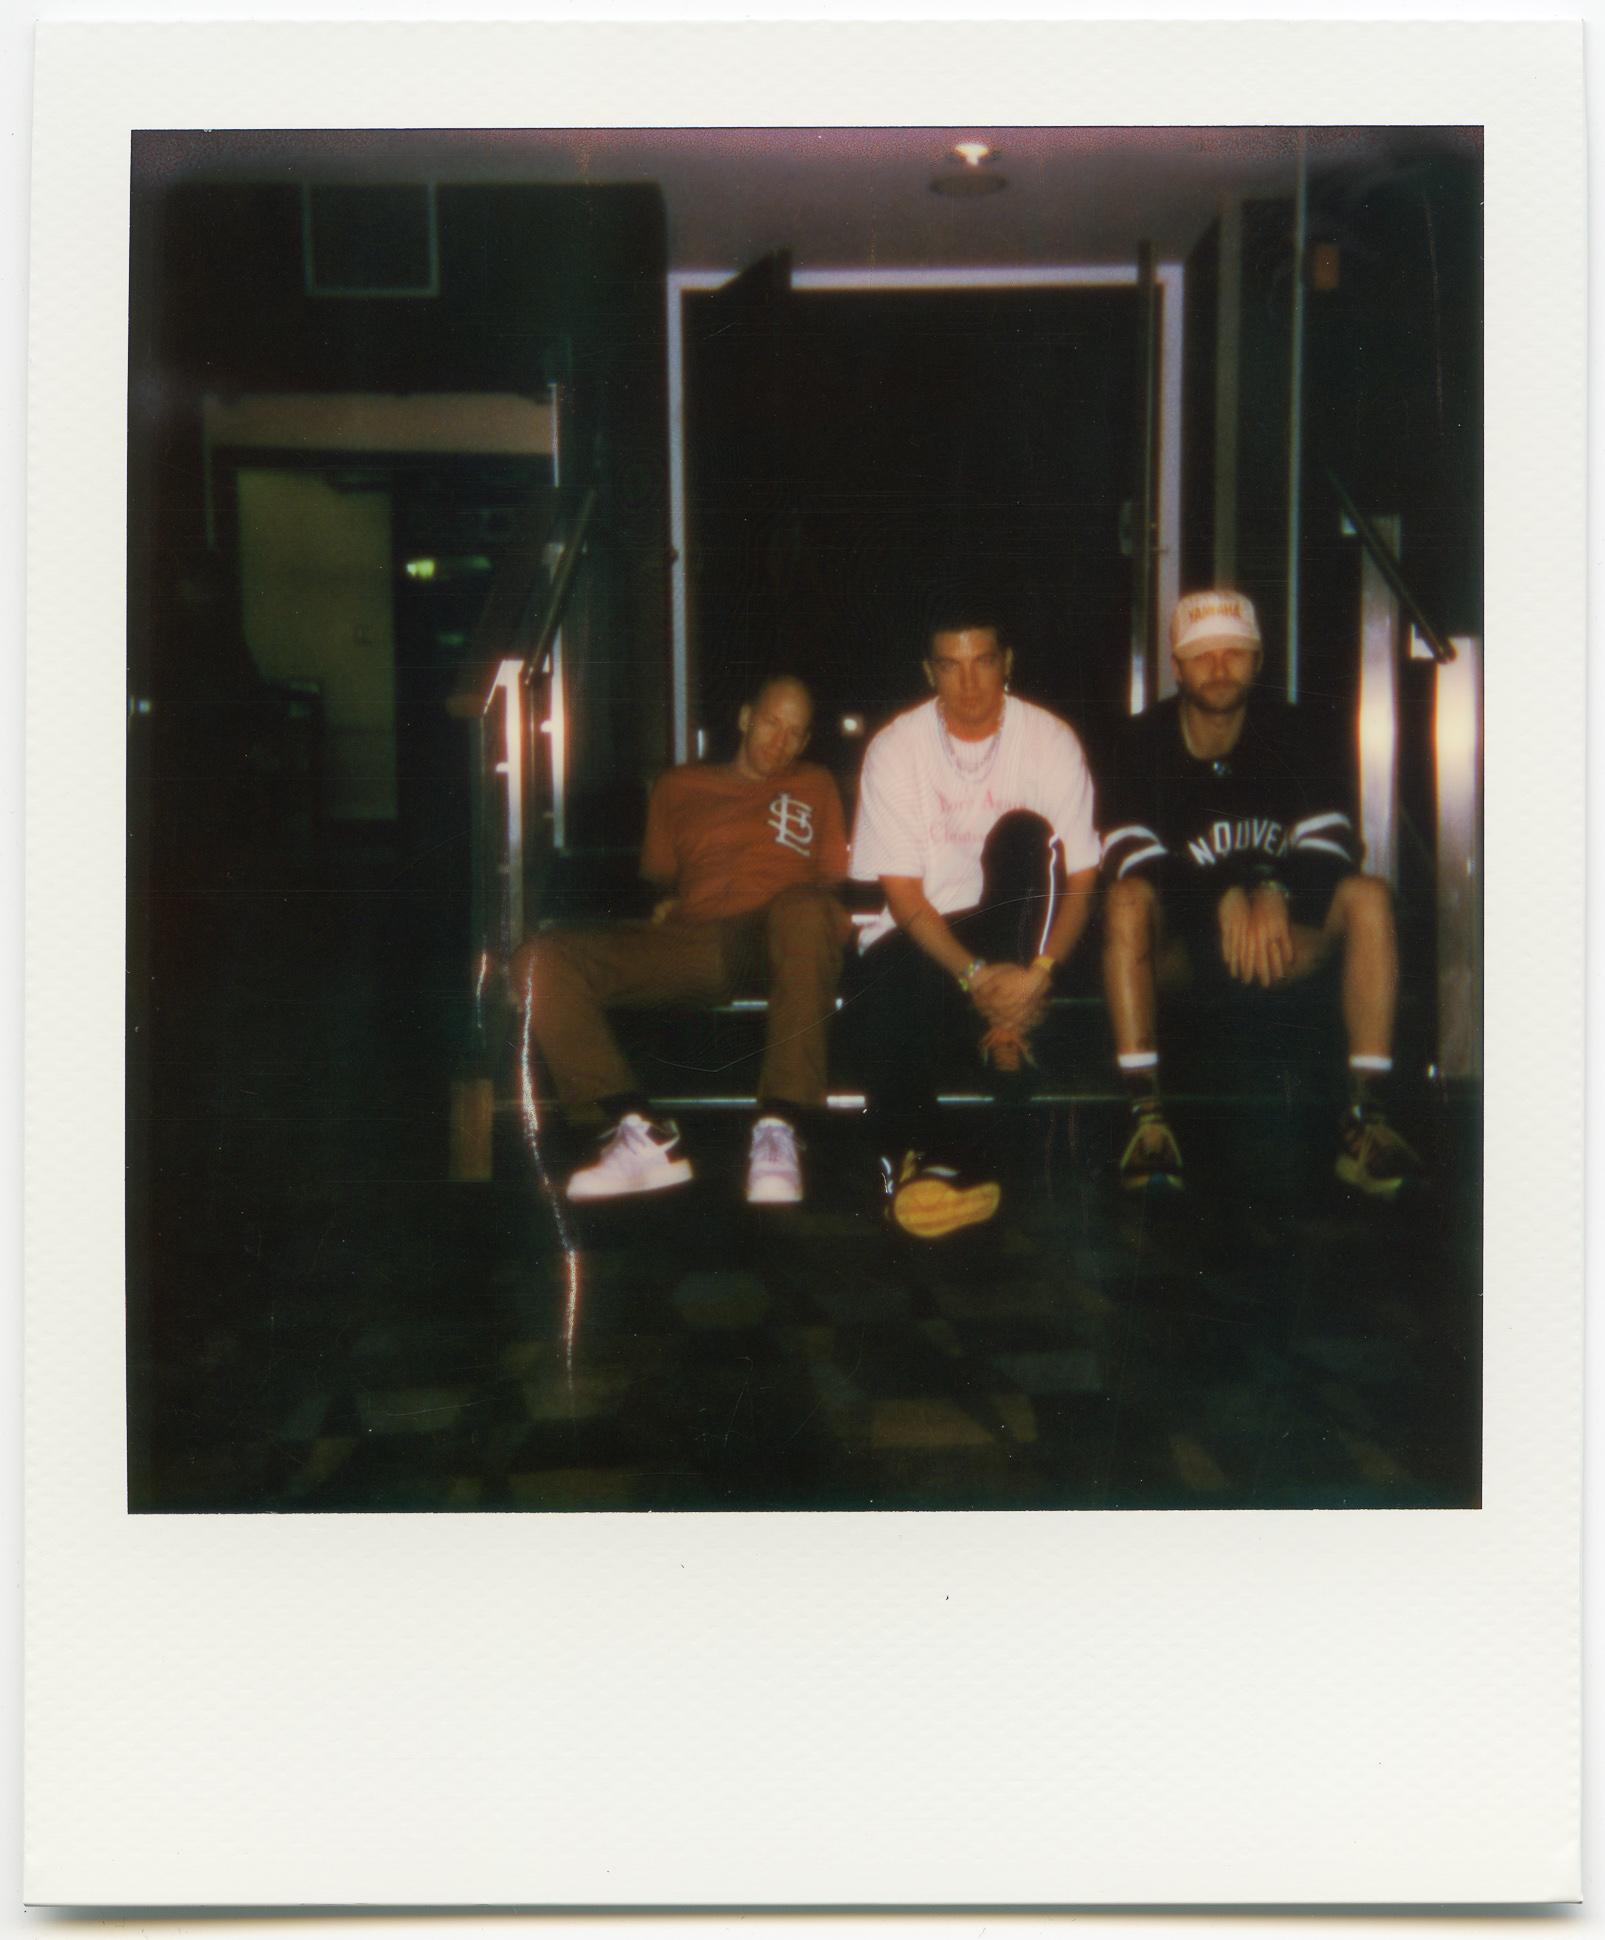 LANY-Polaroid-17-06-2019-Vancouver-1.jpg